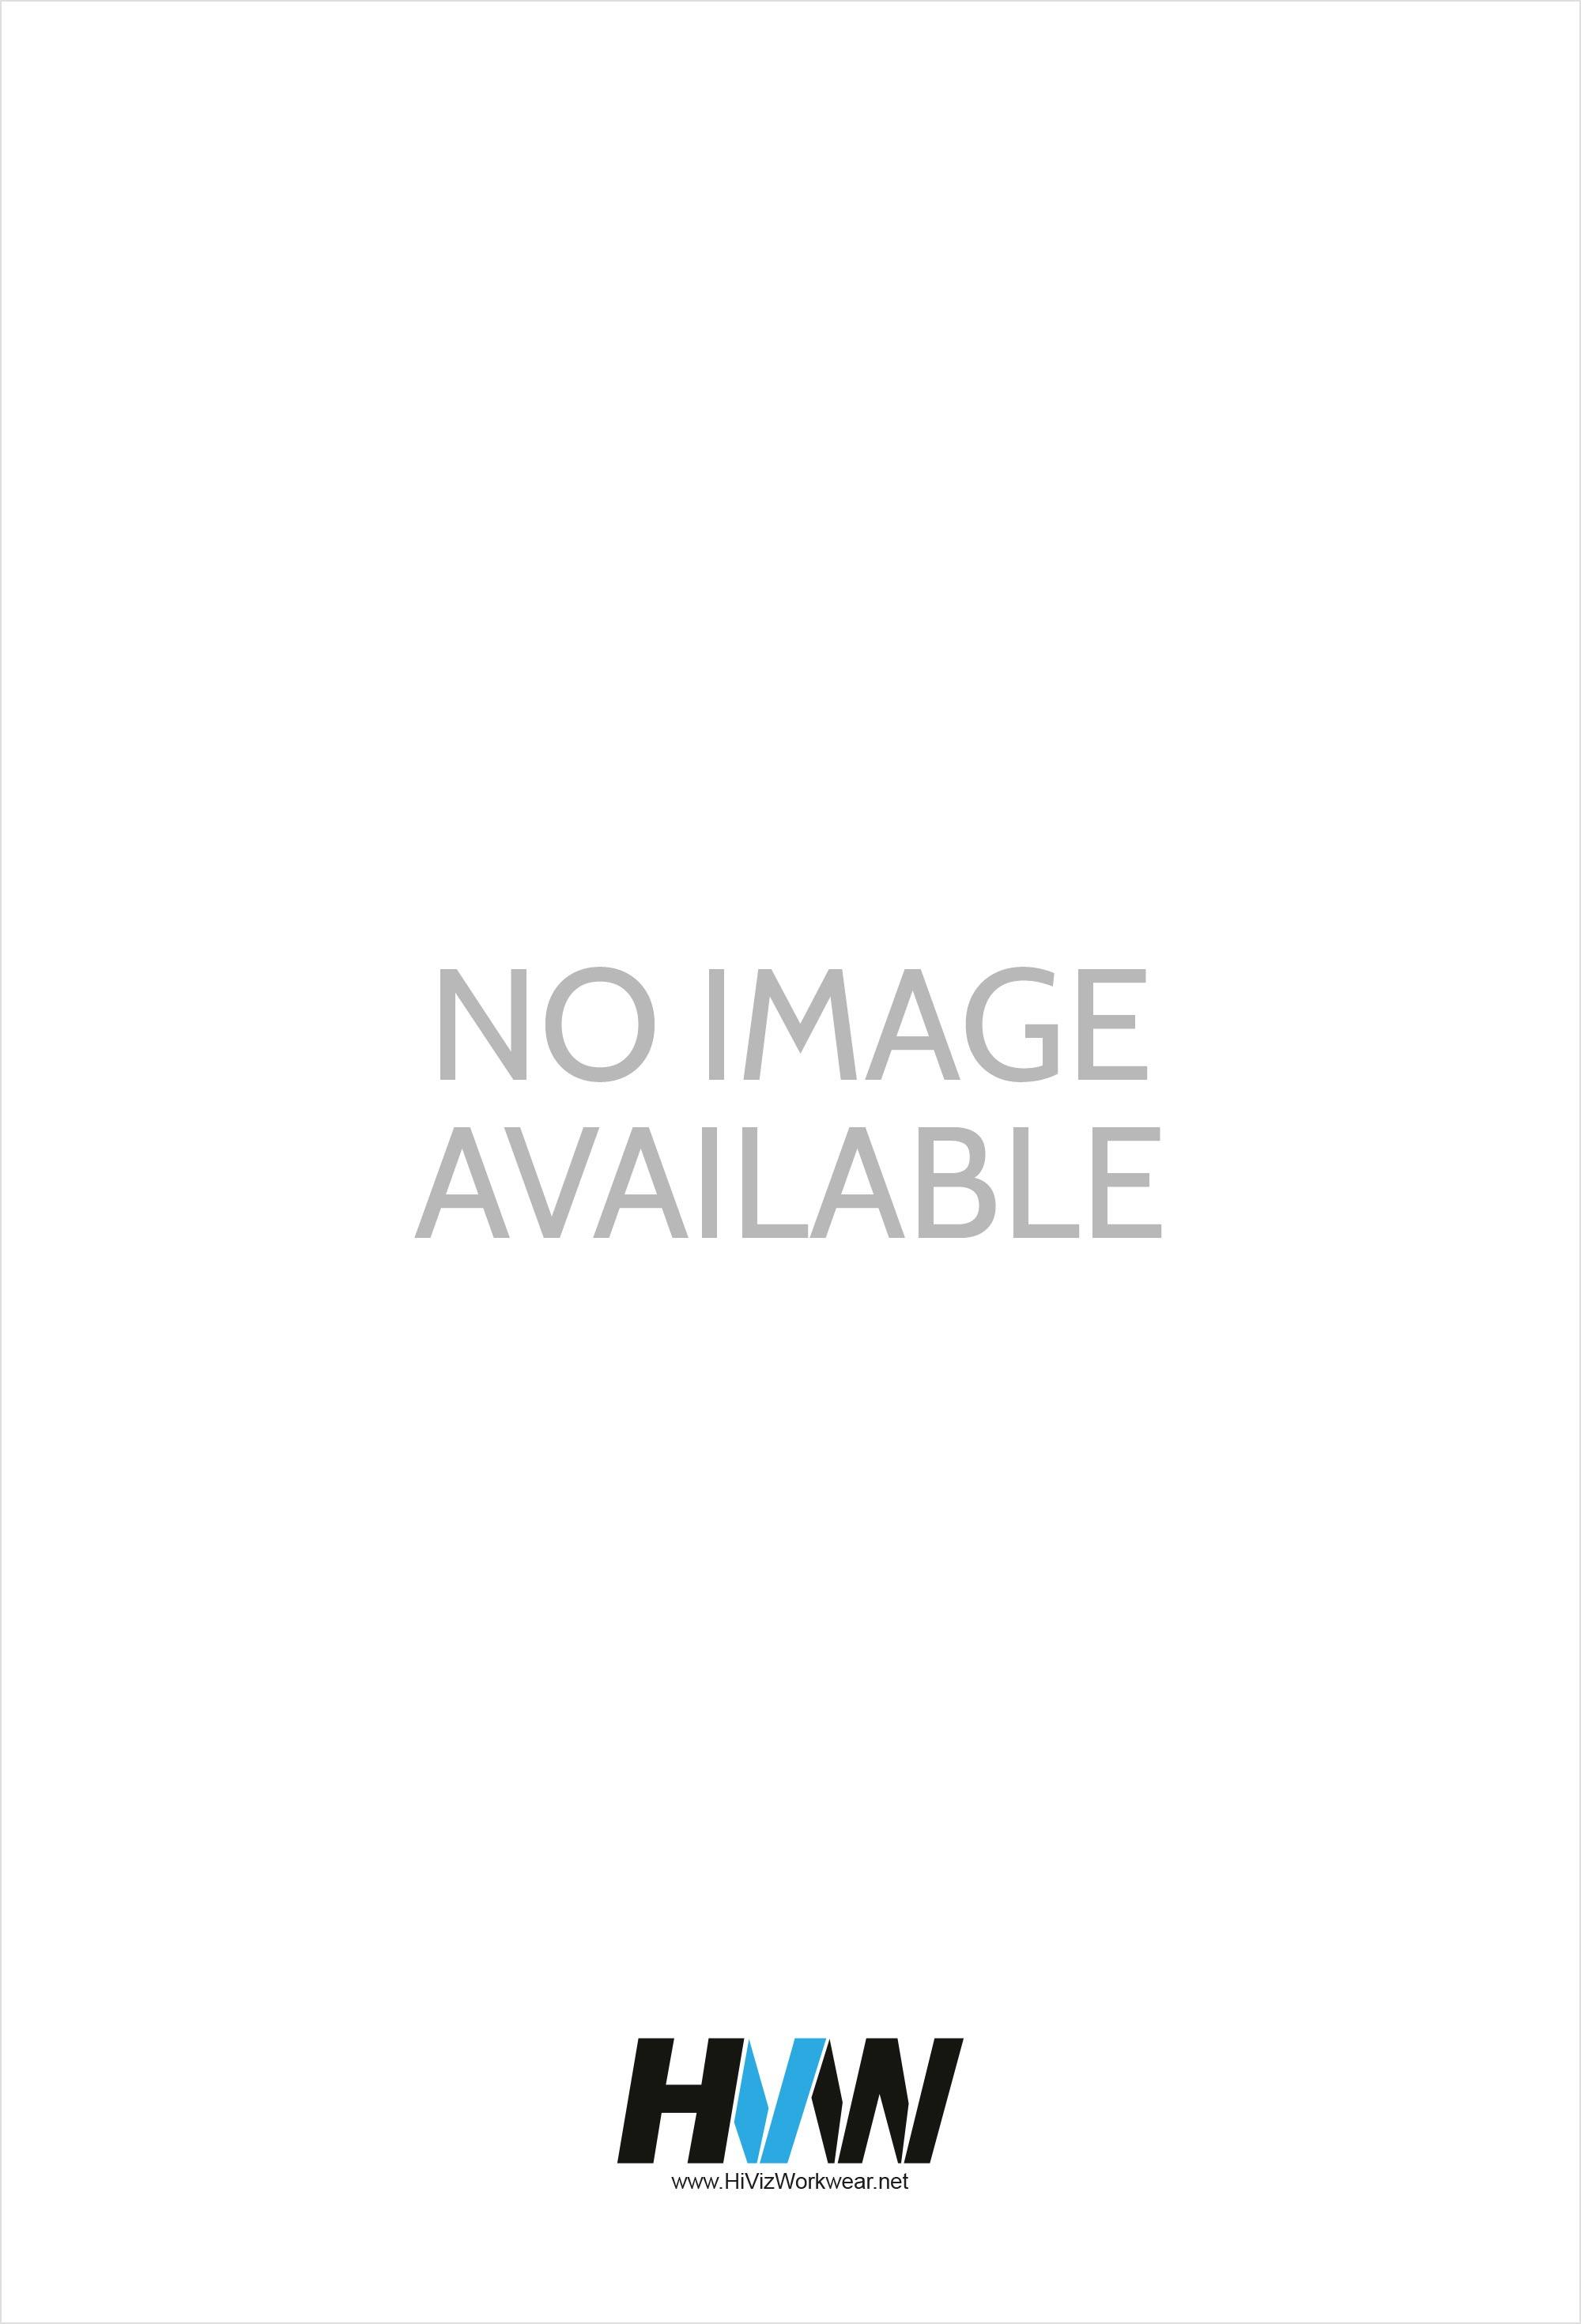 PR202 Short SleevePoplin Shirt  (Collar Size 14.5 To 19.0)